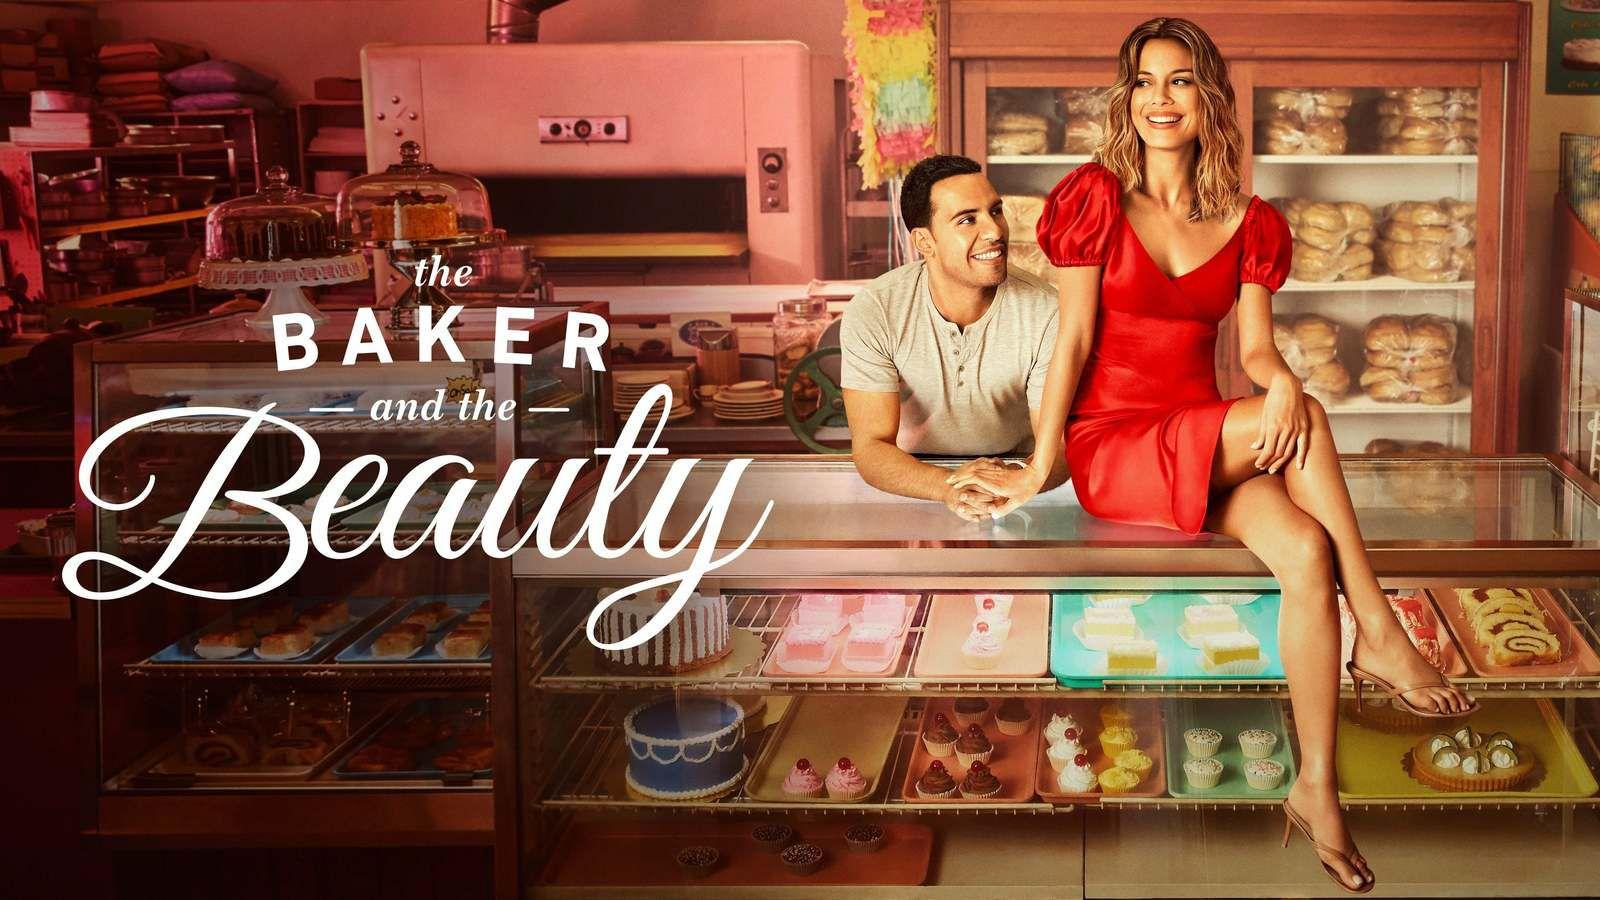 The Baker and The Beauty season 2